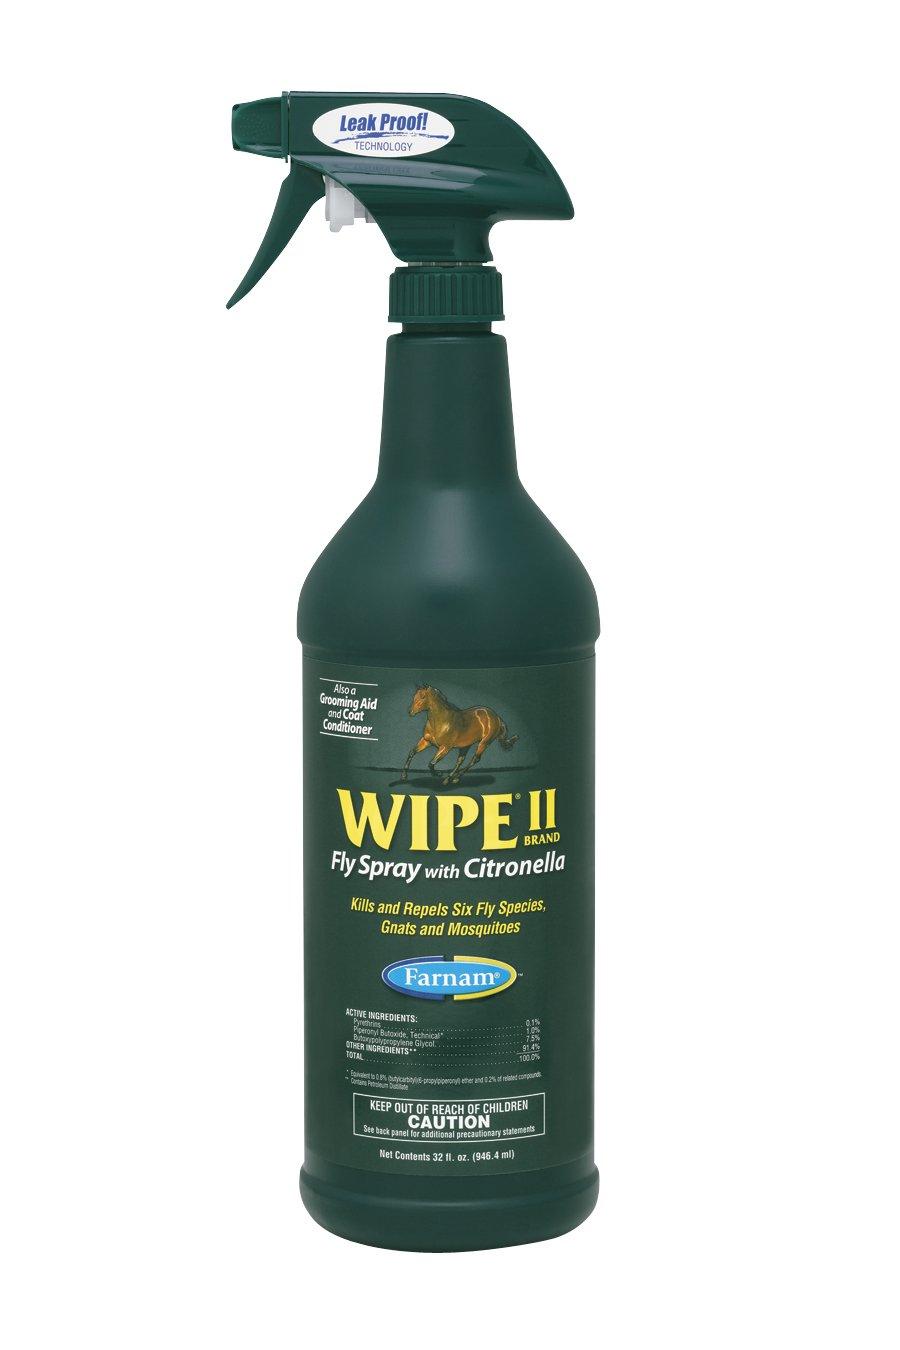 Farnam Wipe II Fly Spray with Citronella, 32 fl. oz.